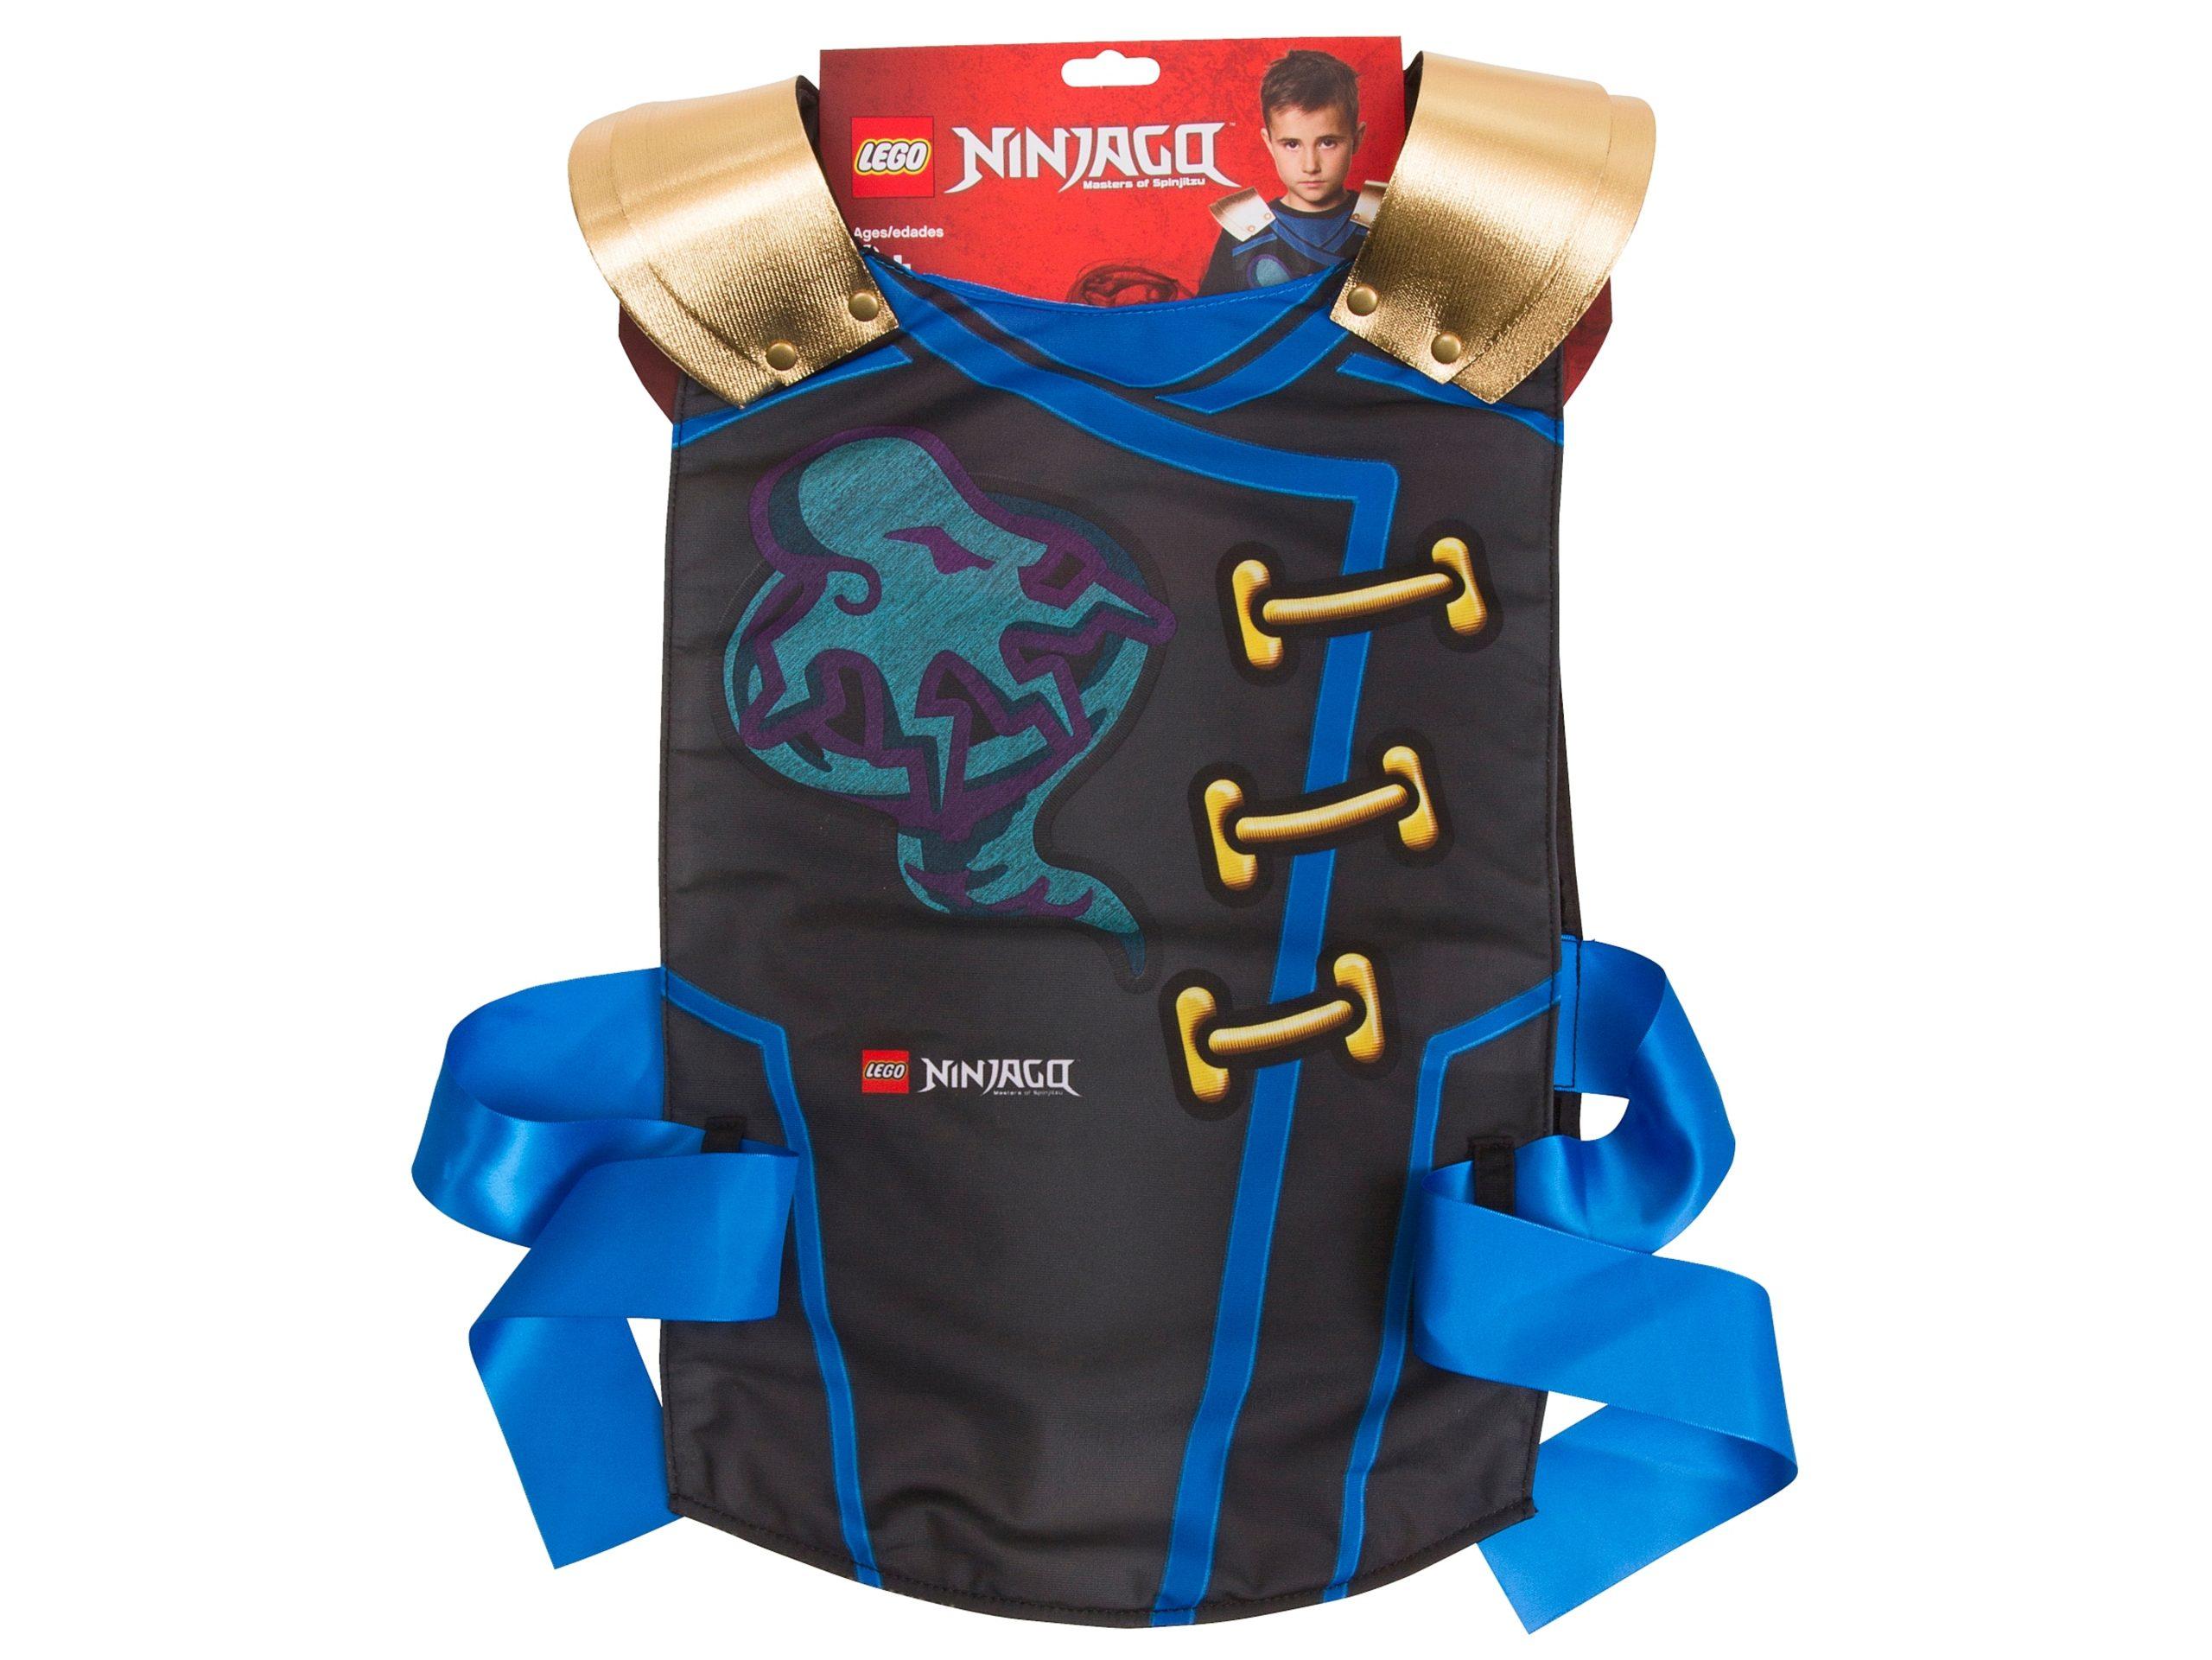 lego 853532 ninjago armor scaled